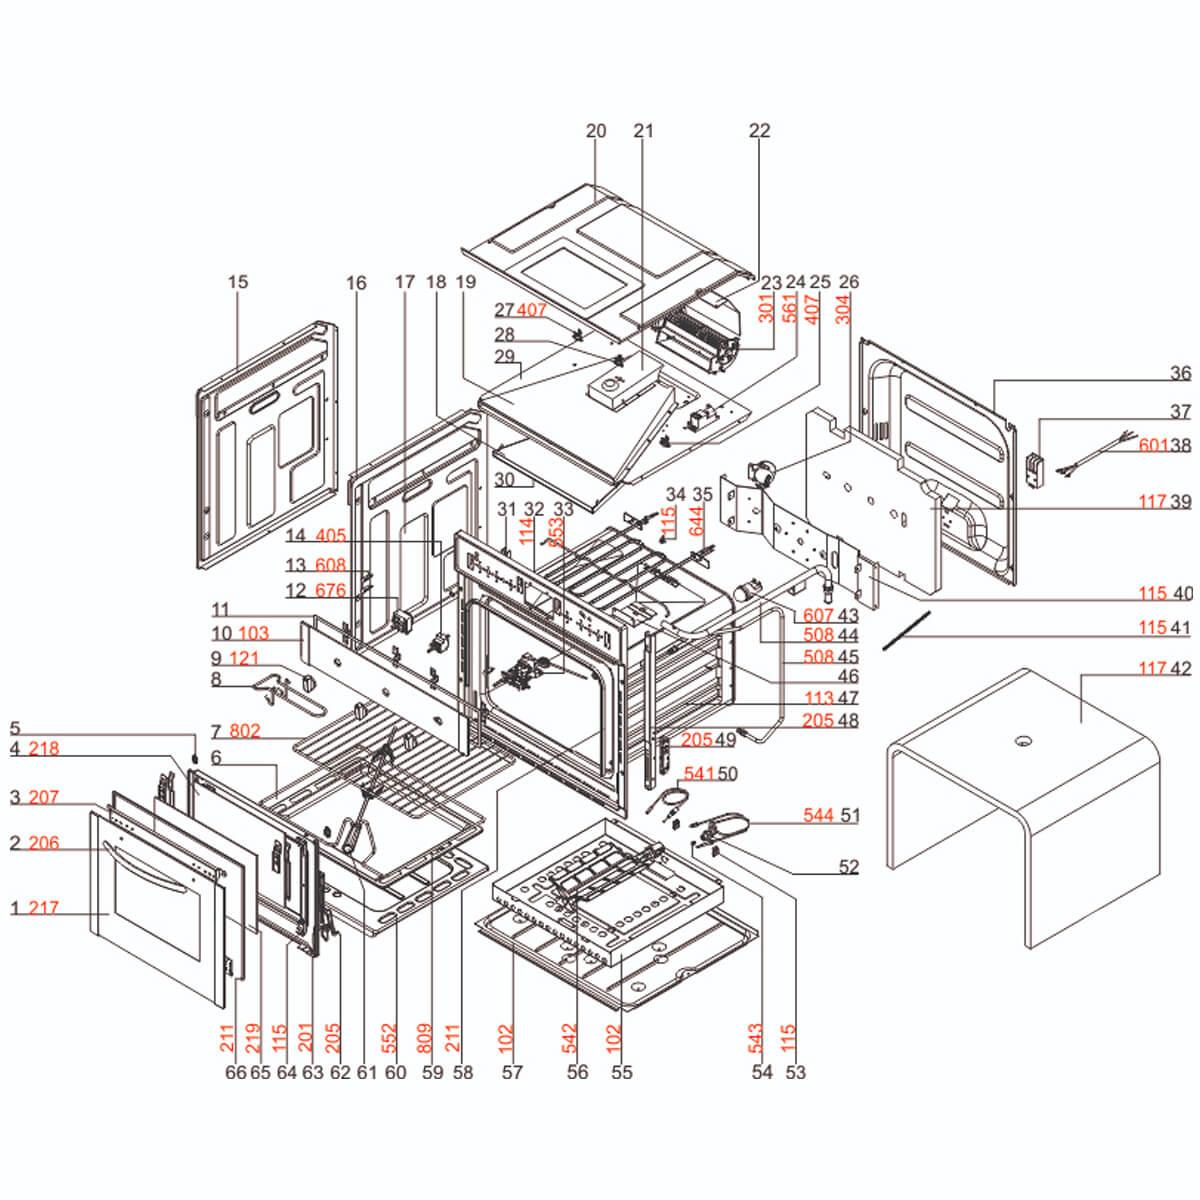 Queimador Forno Electrolux Og7mx Electrolux - 33804001